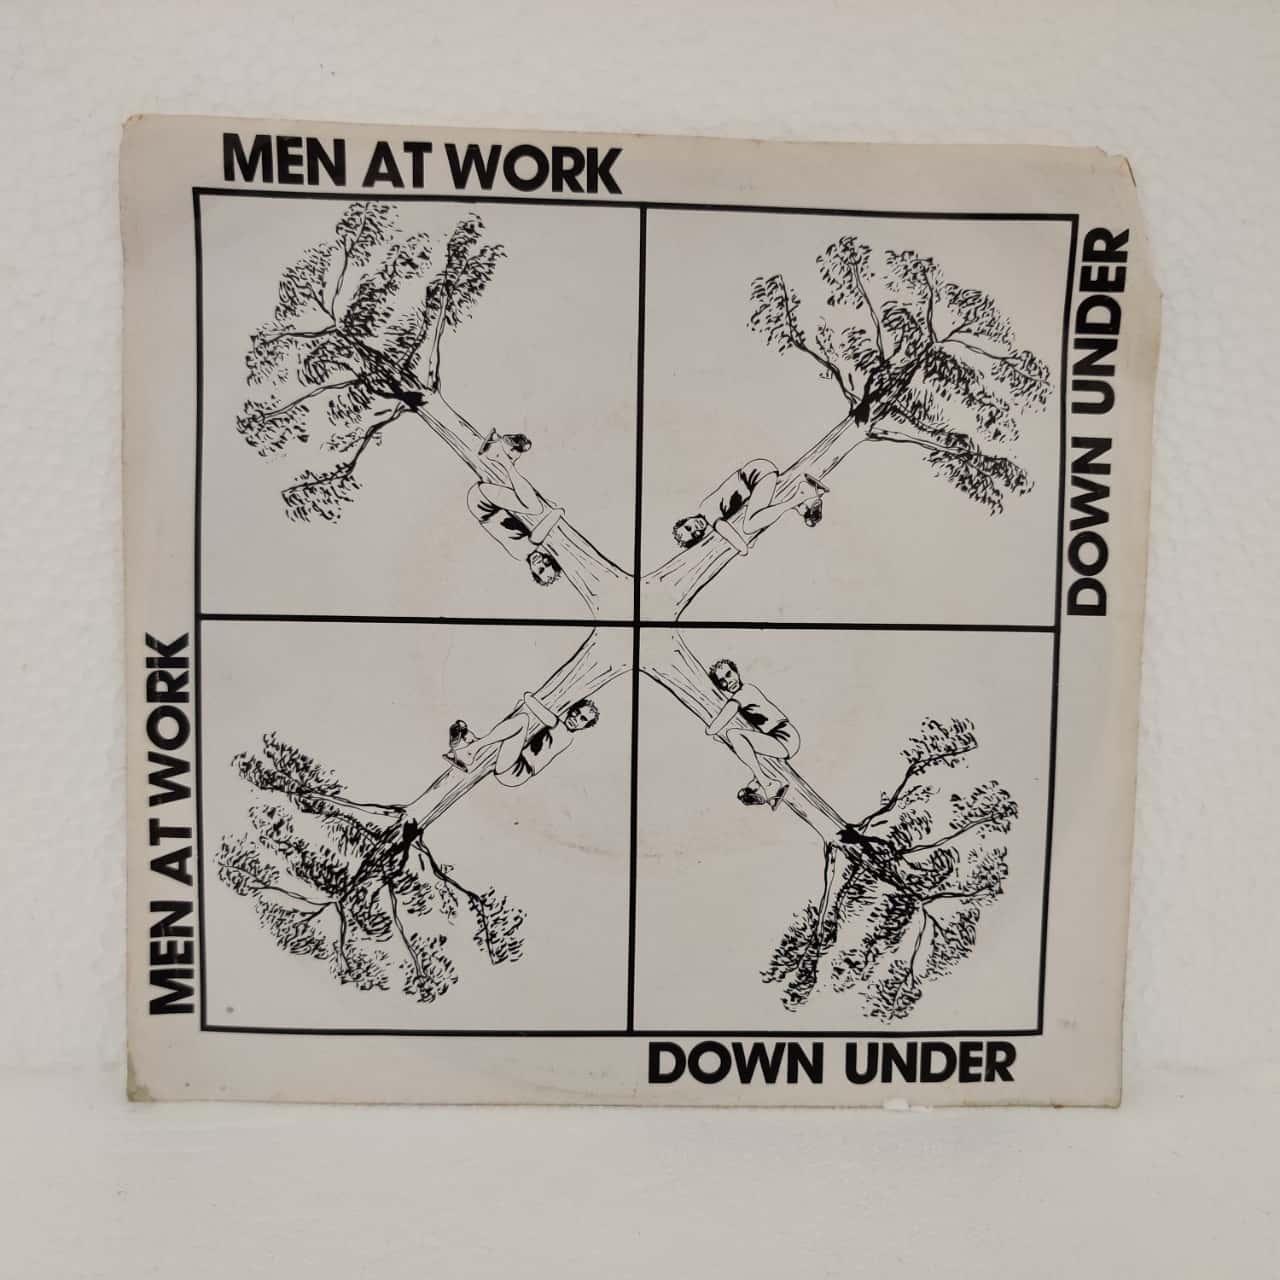 "7"" Single Vinyl Record - Men At Work - Down Under"